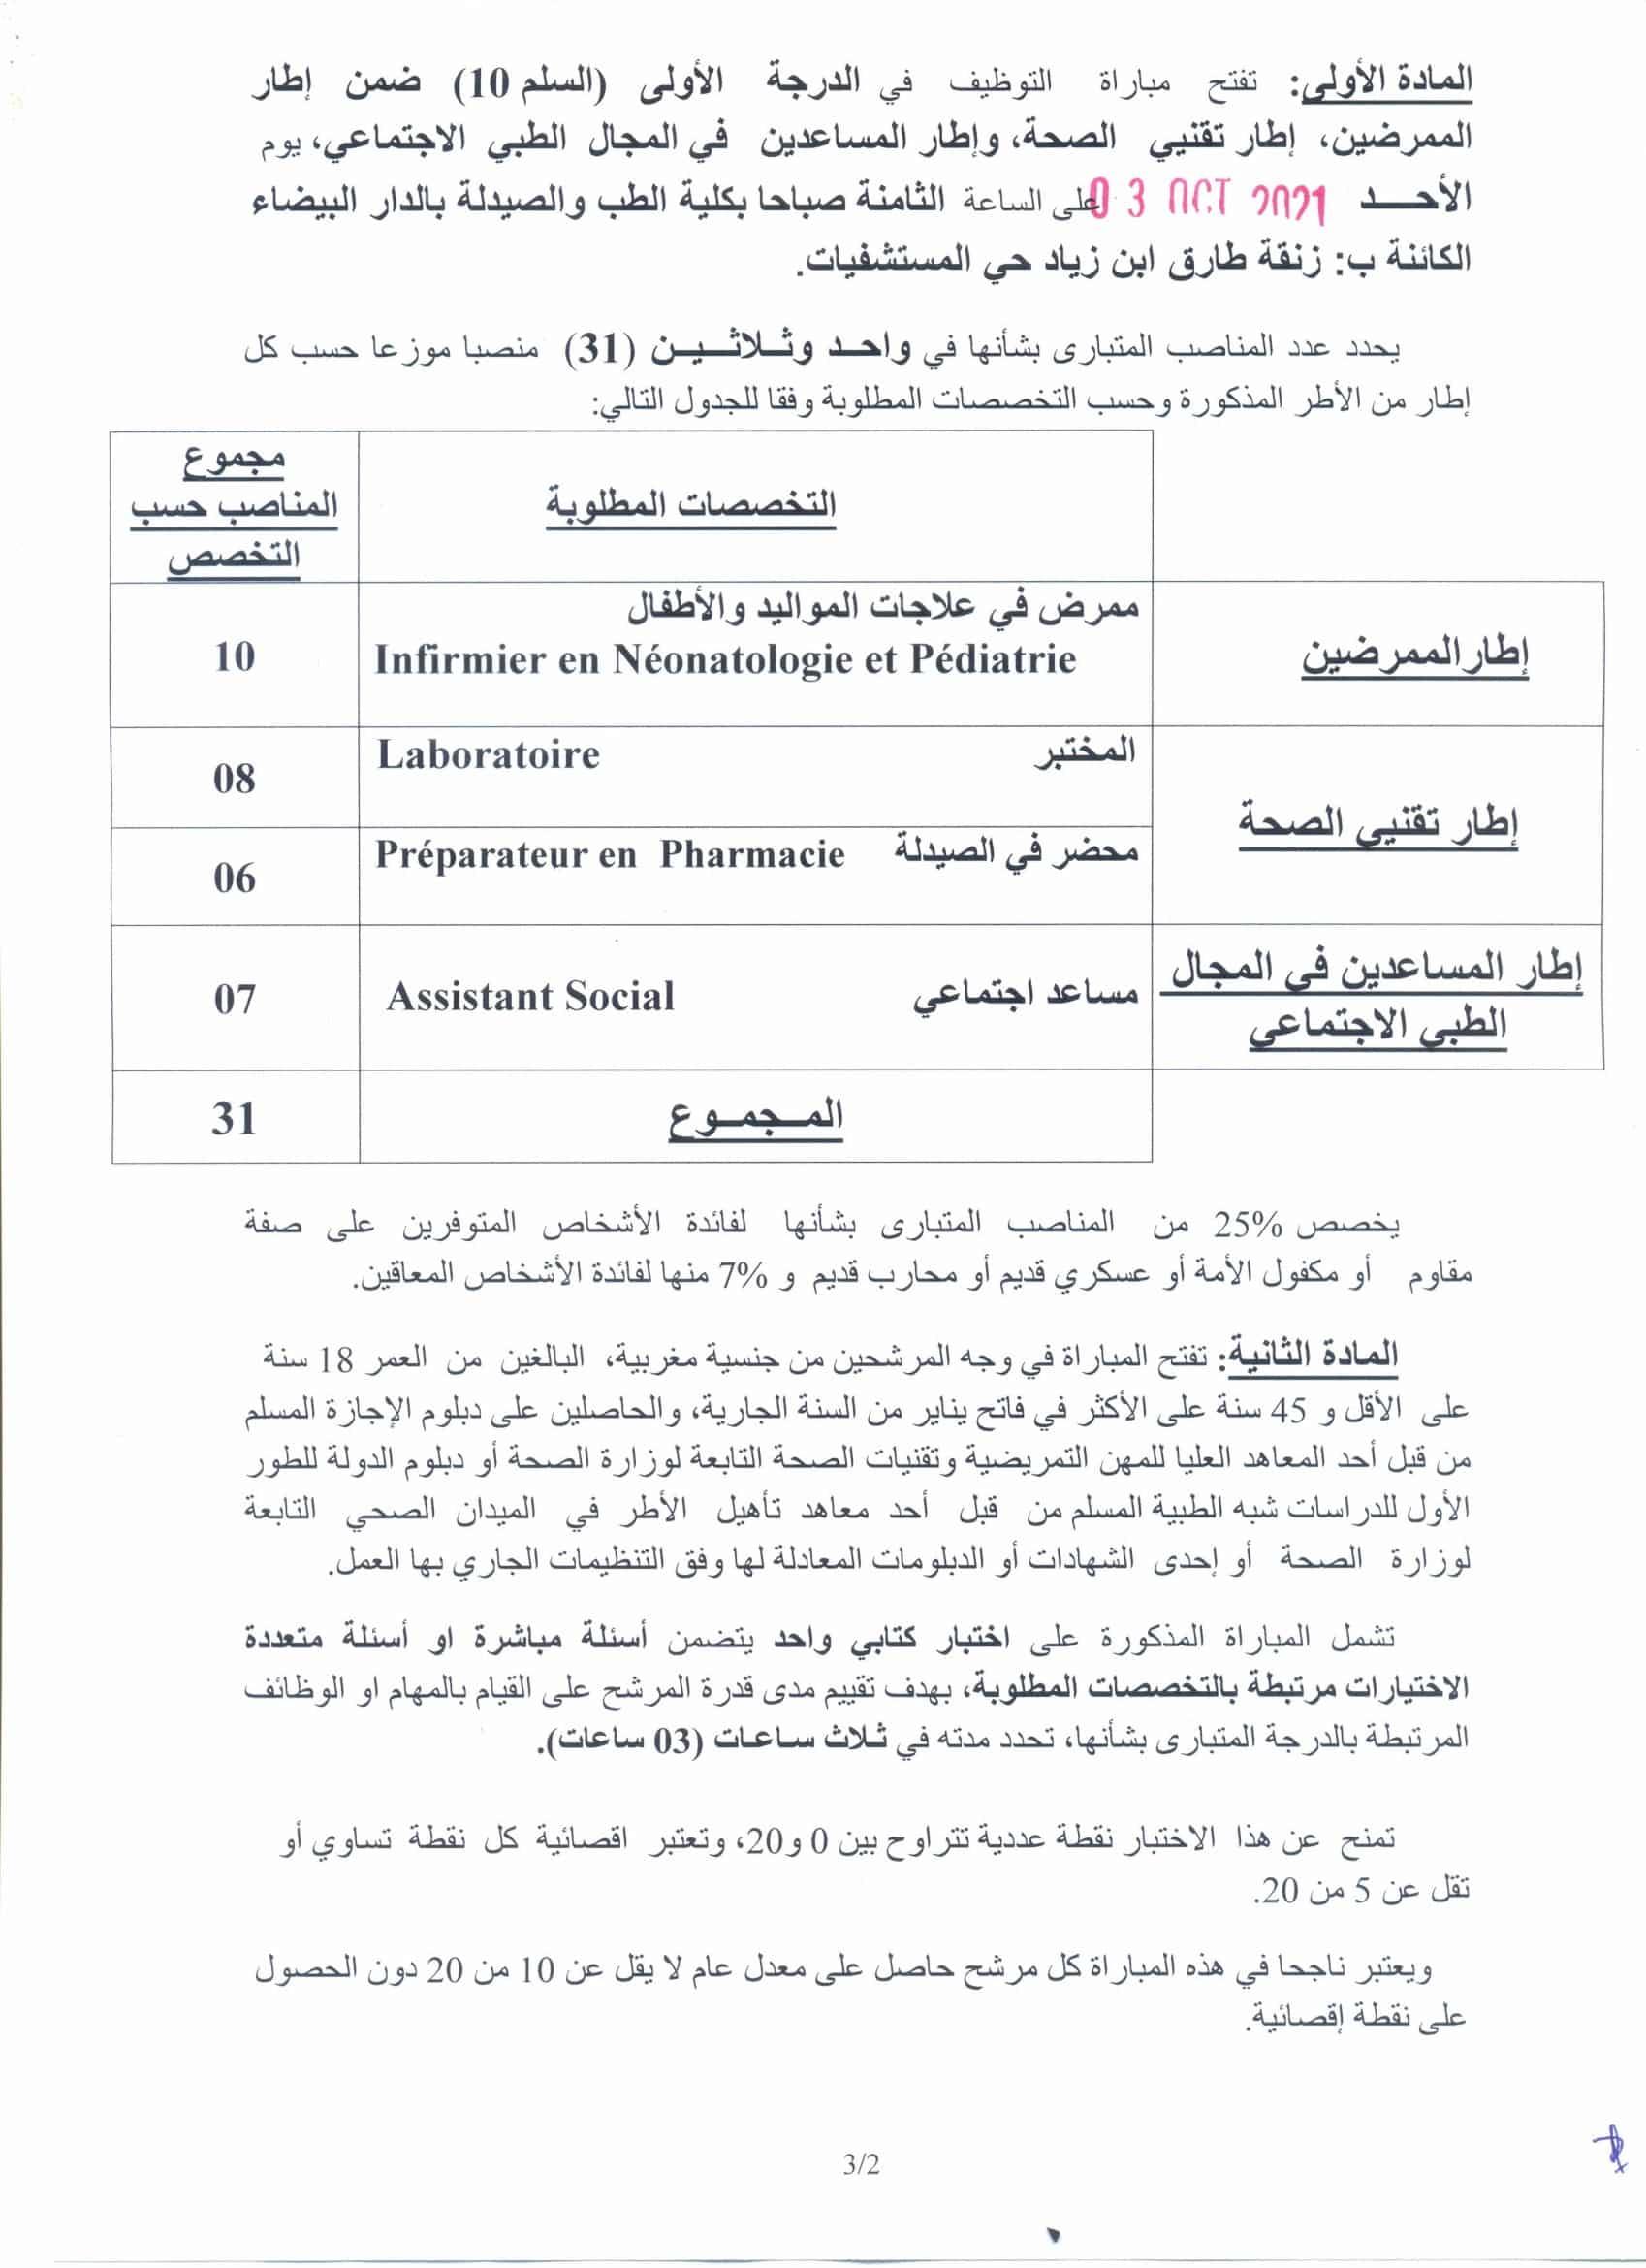 RECRUTINF3102021 2 Concours de Recrutement CHU Ibn Rochd 2021 (156 Postes)